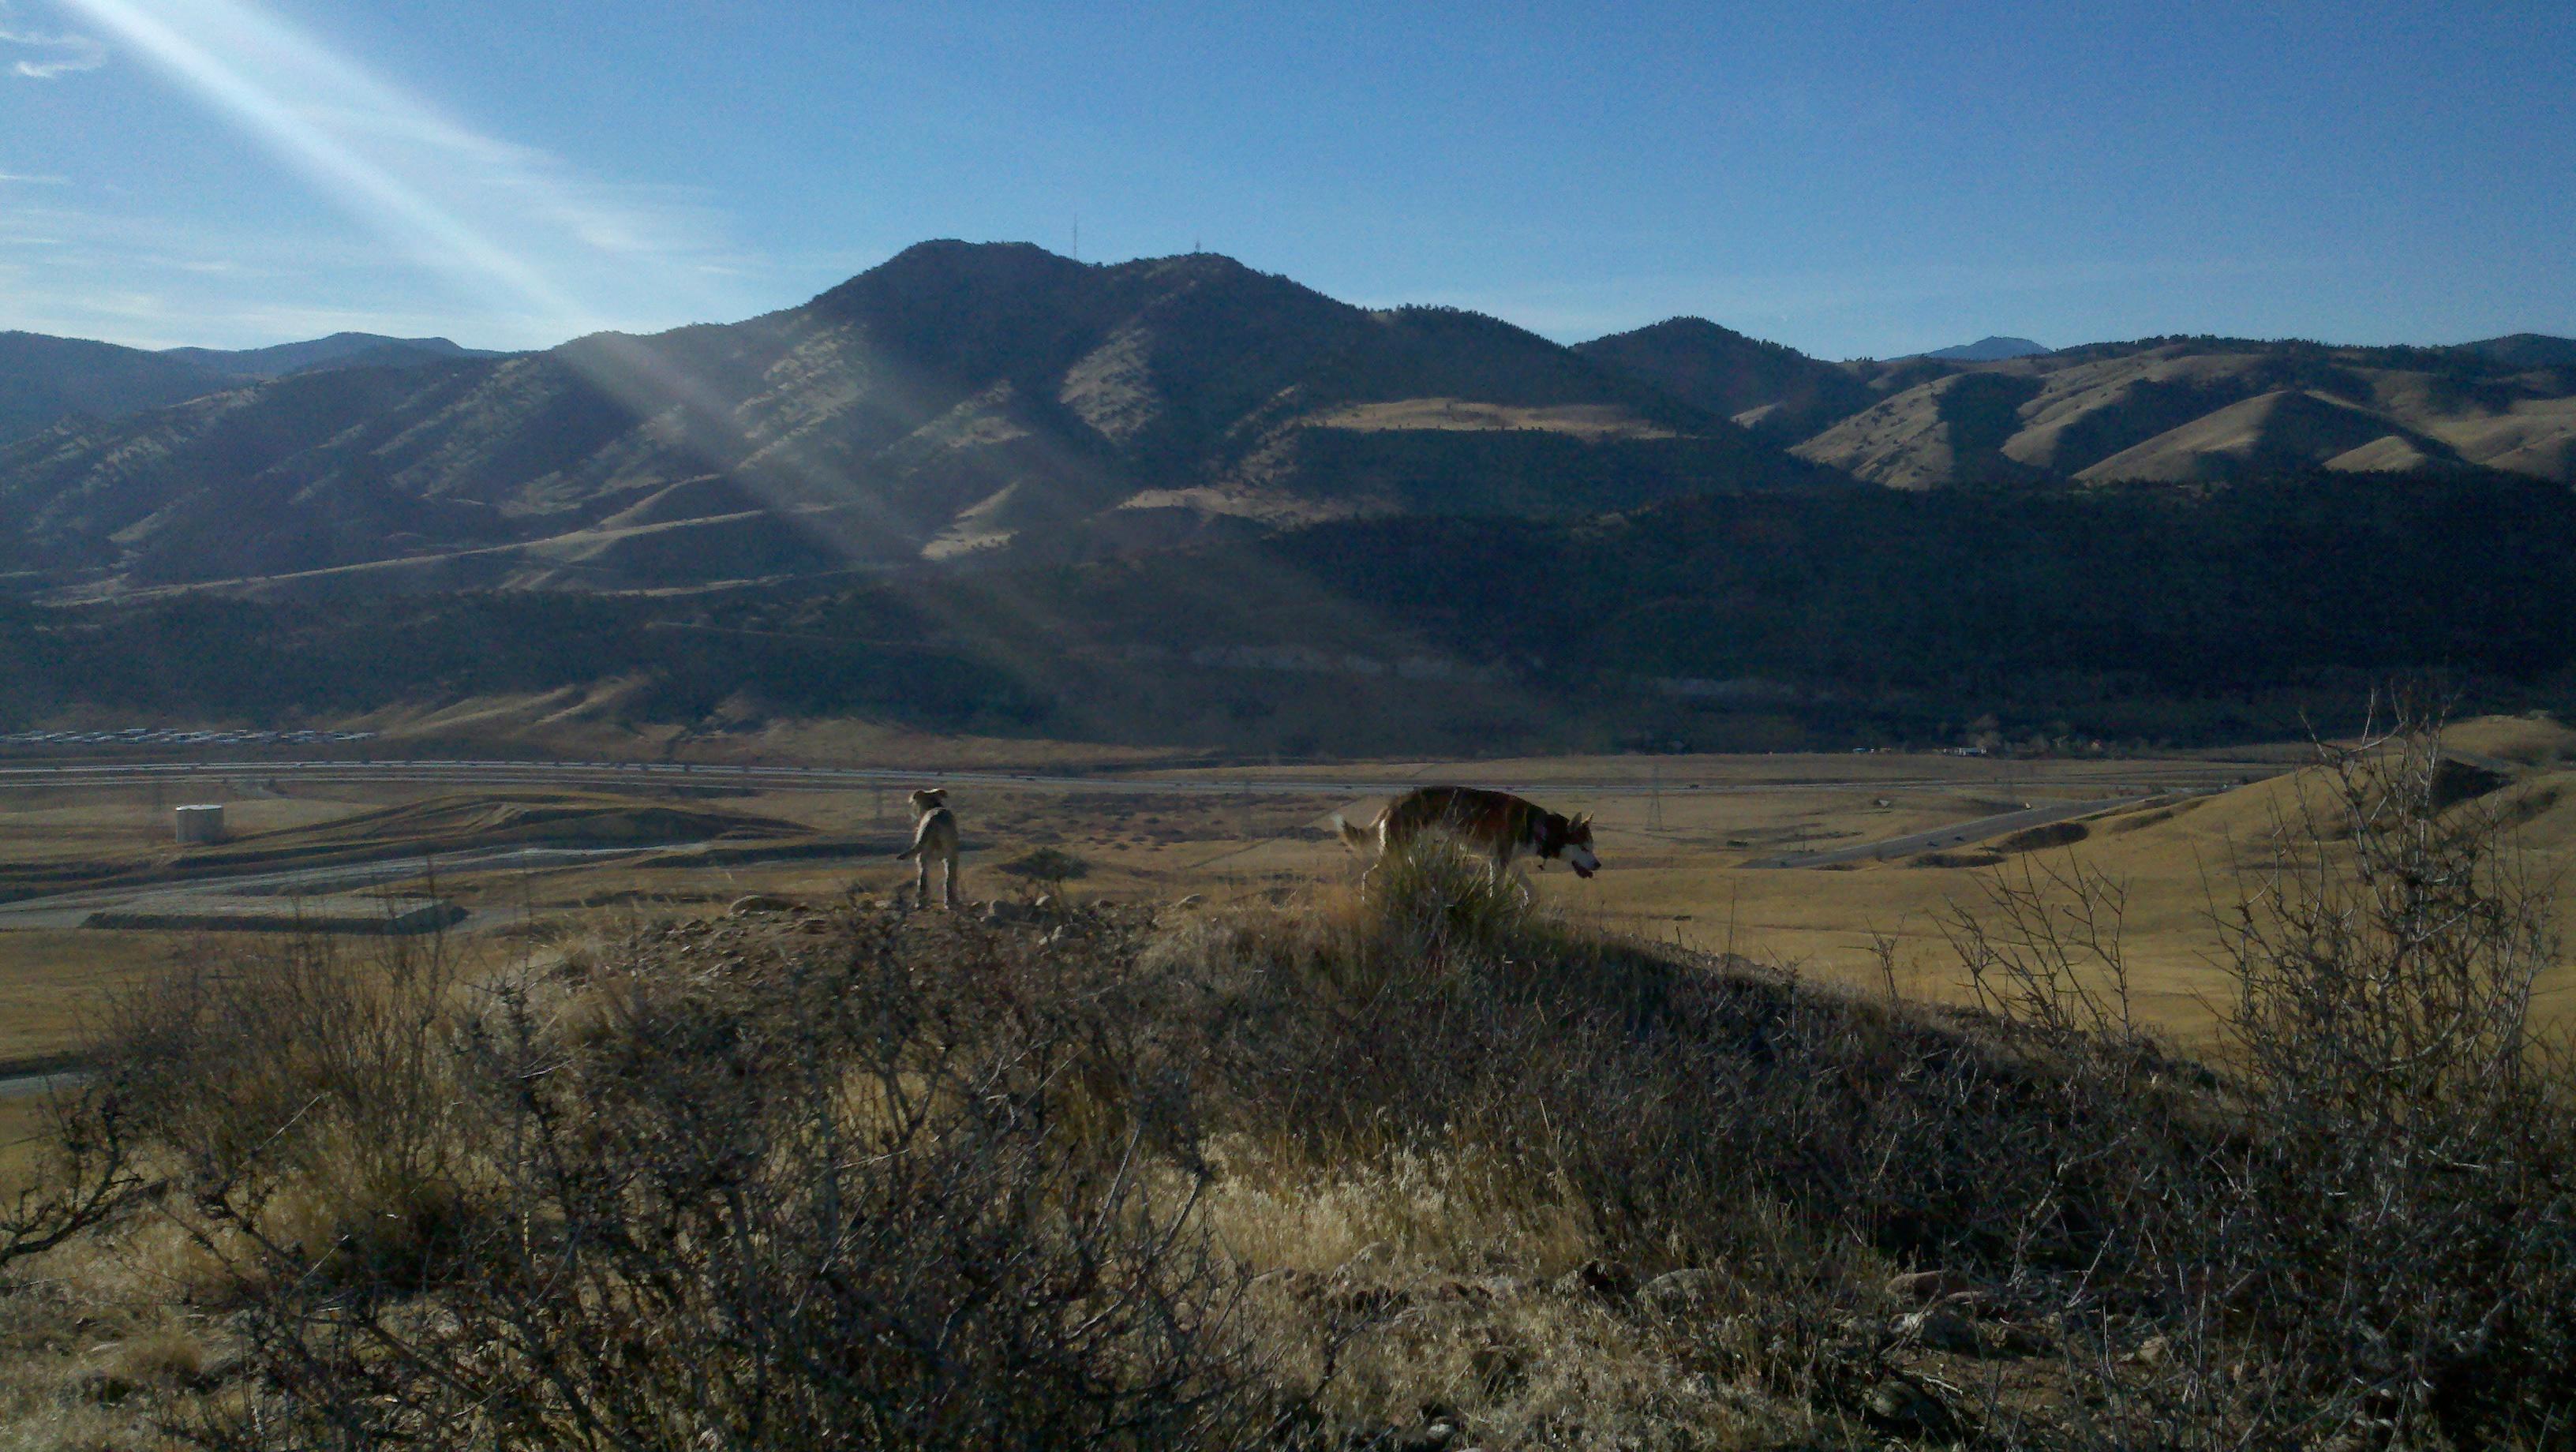 green mountain west trail colorado alltrails - HD3264×1840